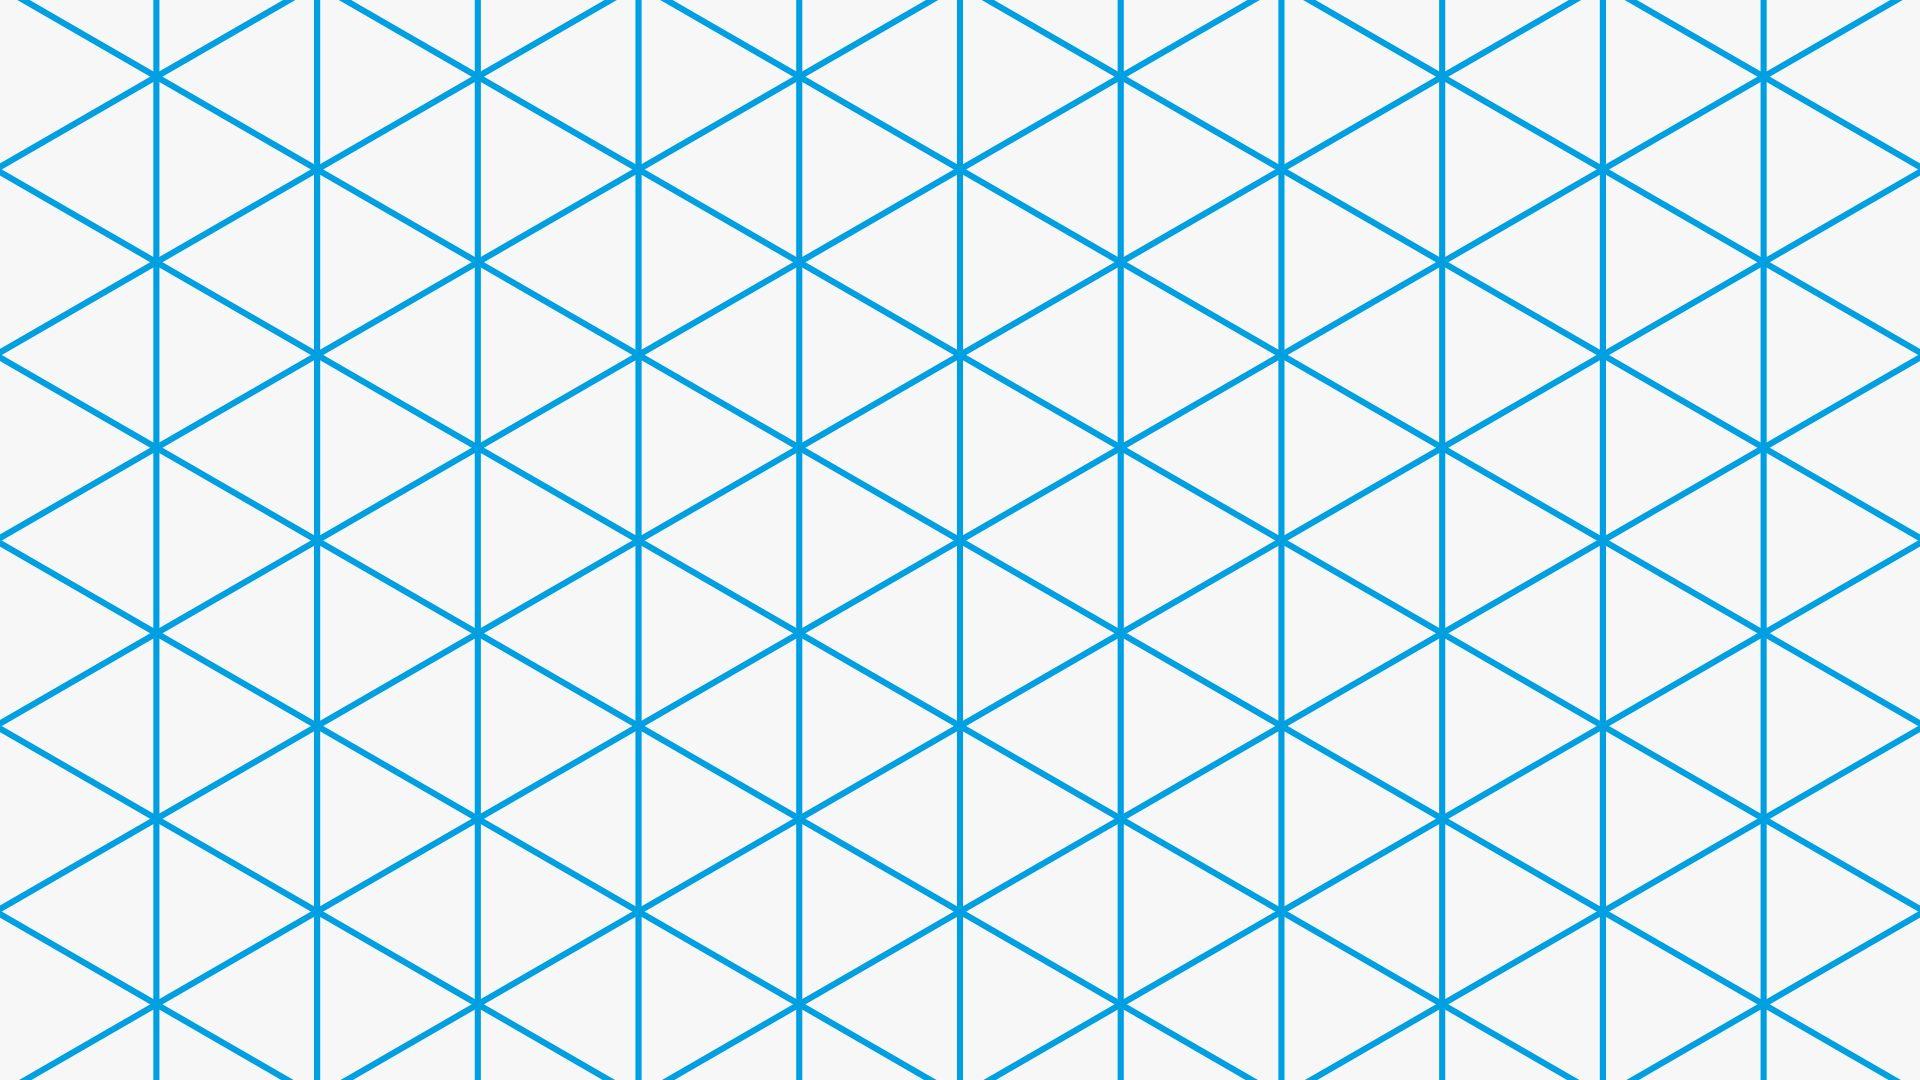 Isometric Grid in Illustrator